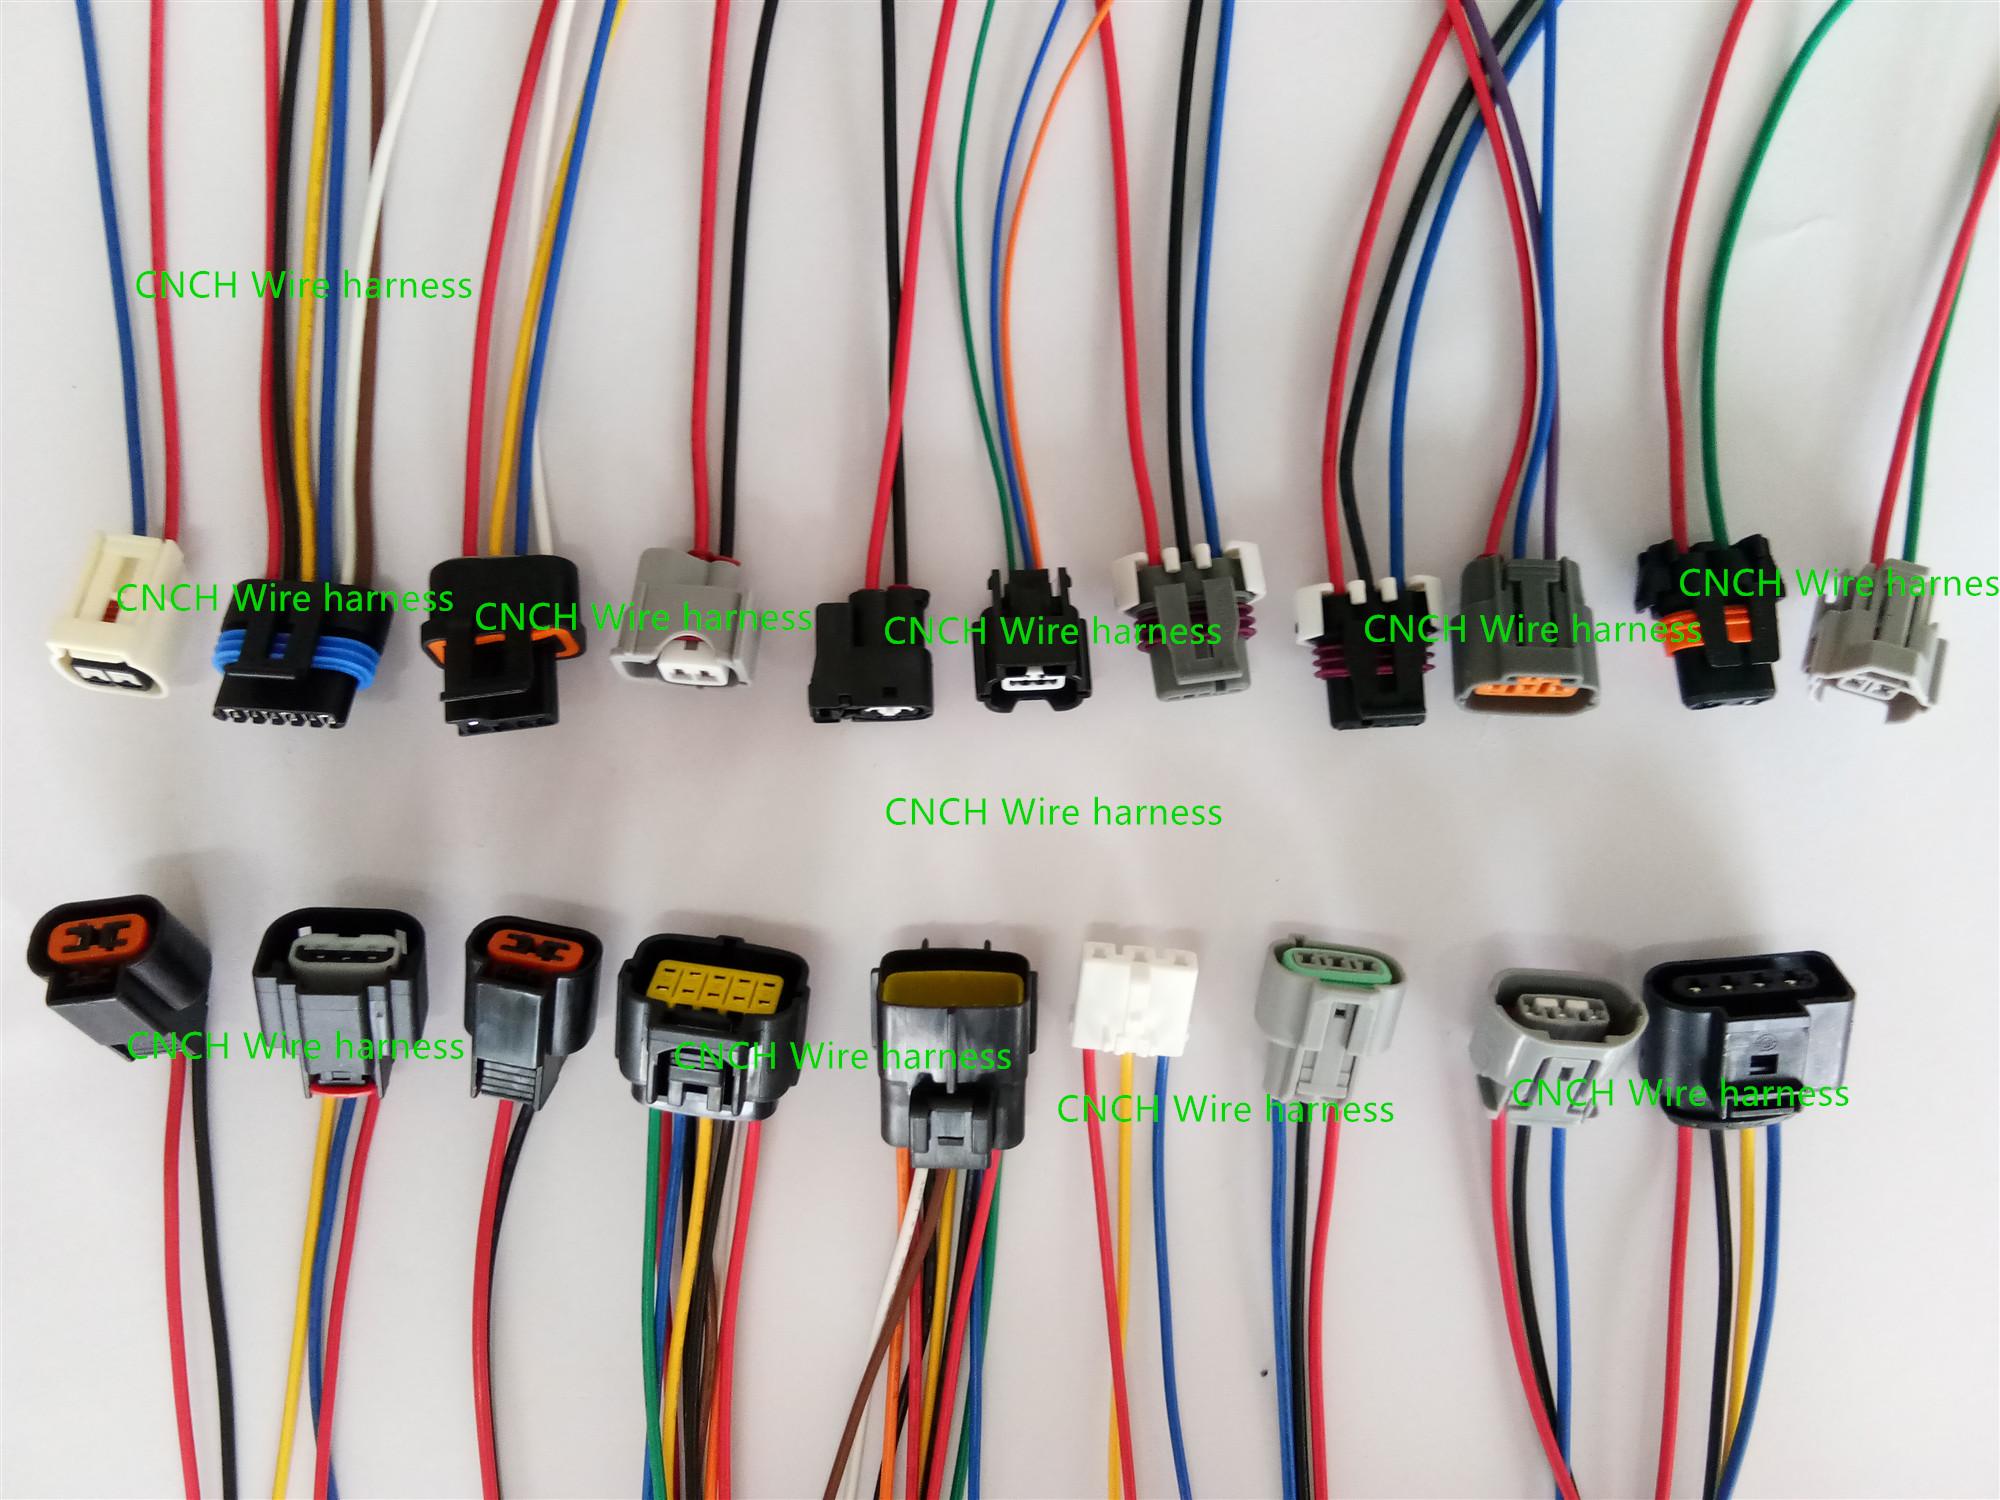 Auto Wire Harness Customization Connector Wire Tail Repair Or Modification  Use Sensor Extension Harness - Buy Car Connector Wire Tail Wiring Harness, Car Sensor Harness,Automobile Wire Harness Product on Alibaba.comAlibaba.com